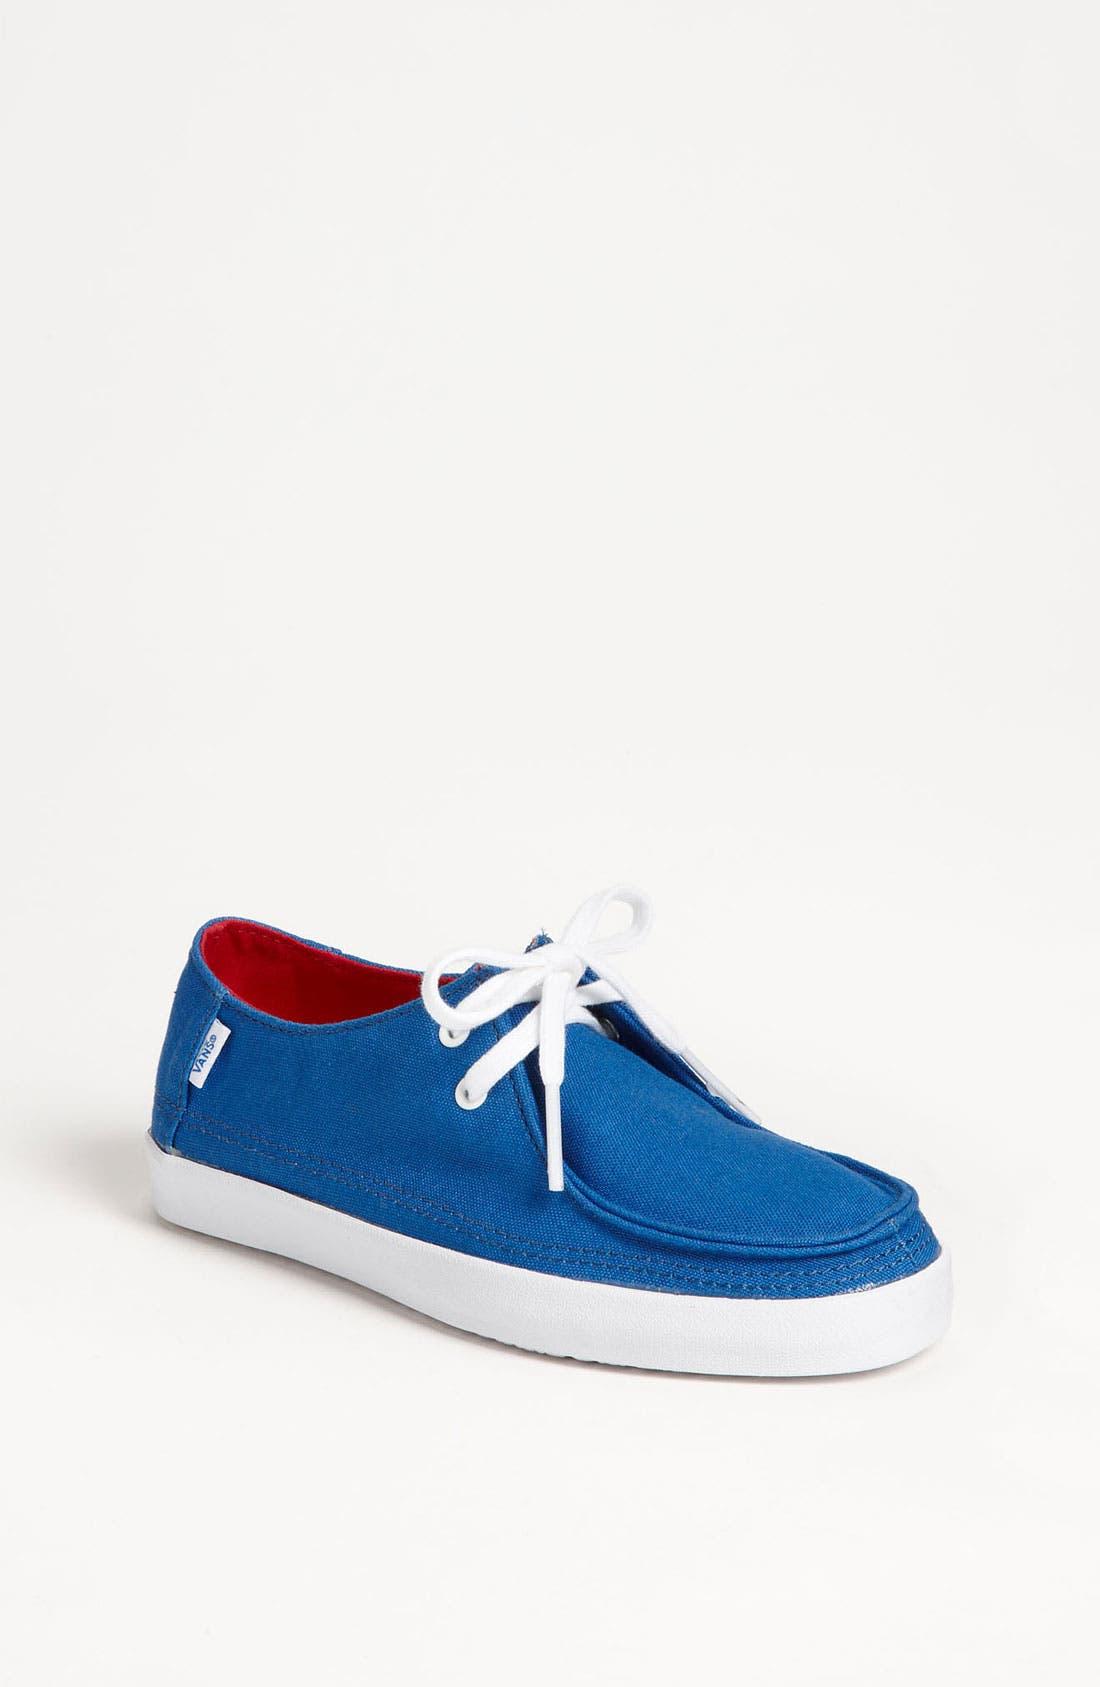 Alternate Image 1 Selected - Vans 'Rata' Sneaker (Toddler, Little Kid & Big Kid)